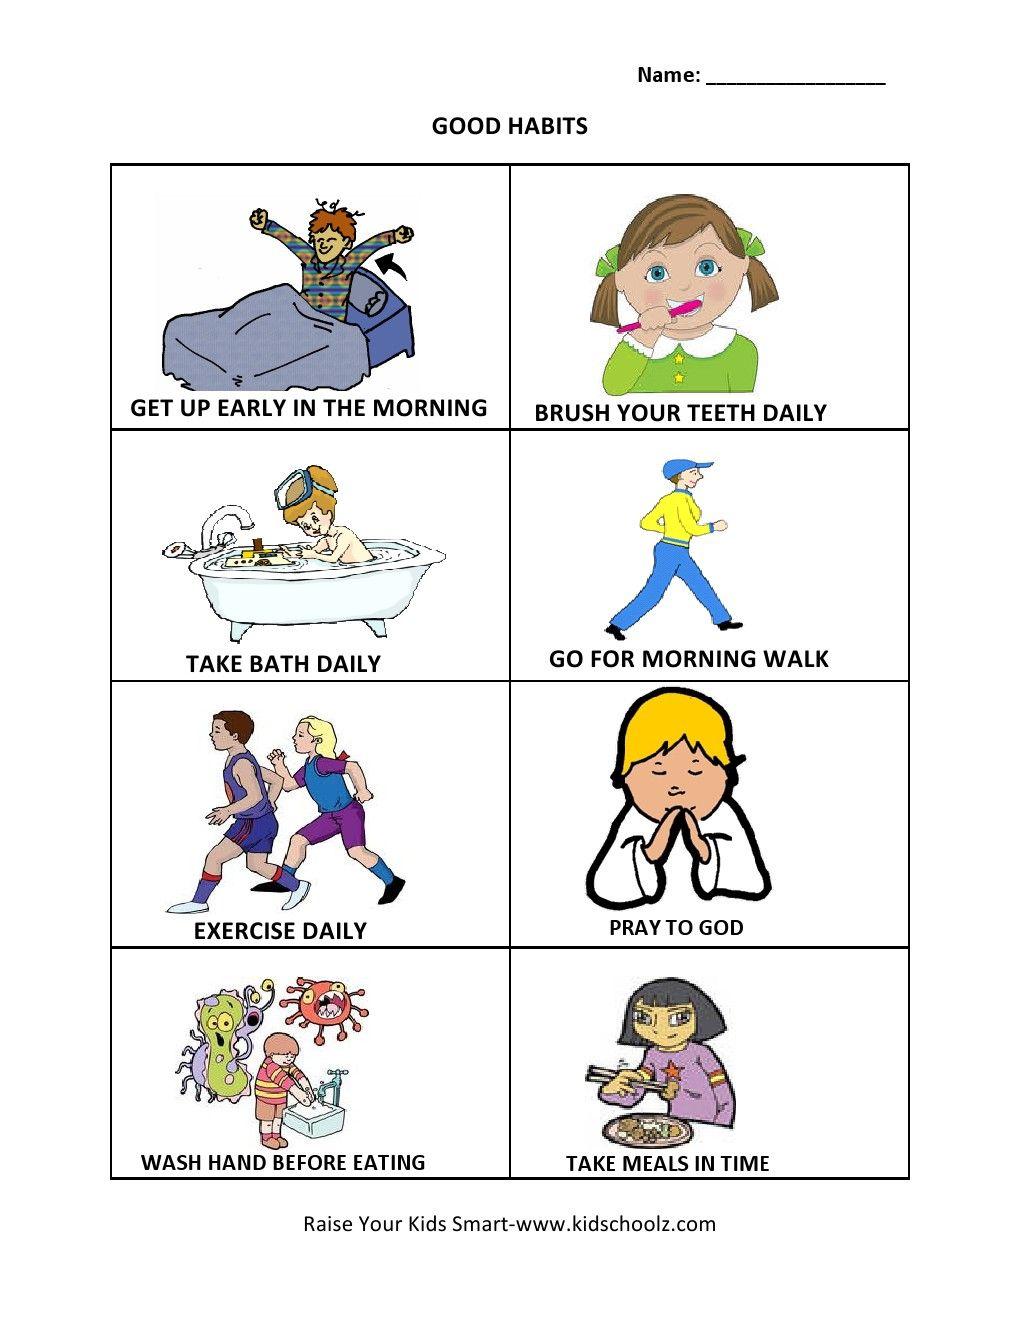 medium resolution of Grade 1 - Good Habits Worksheet -   Good habits for kids